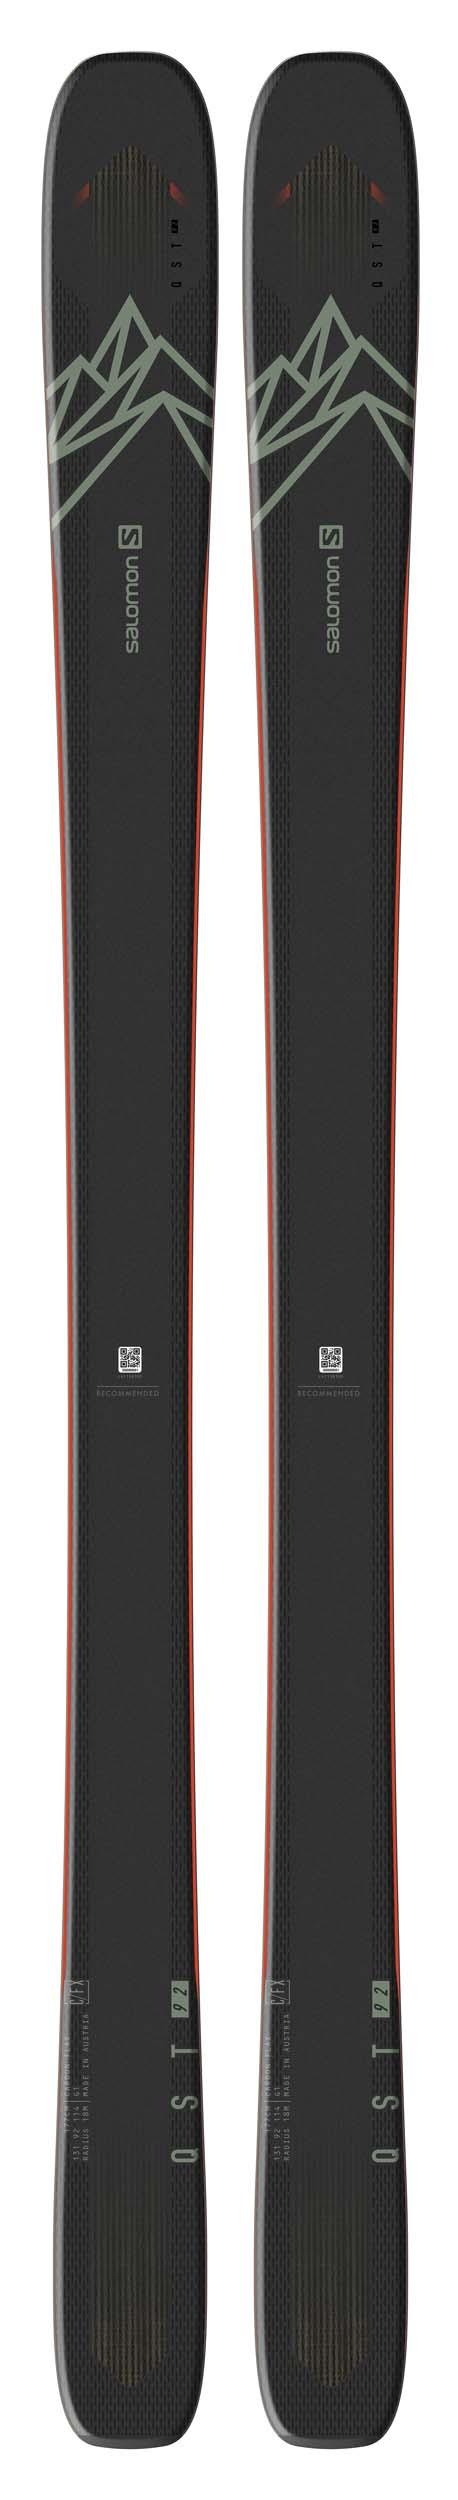 Salomon 2021 QST 92 Skis (Without Bindings / Flat) NEW !! 161,177,185cm